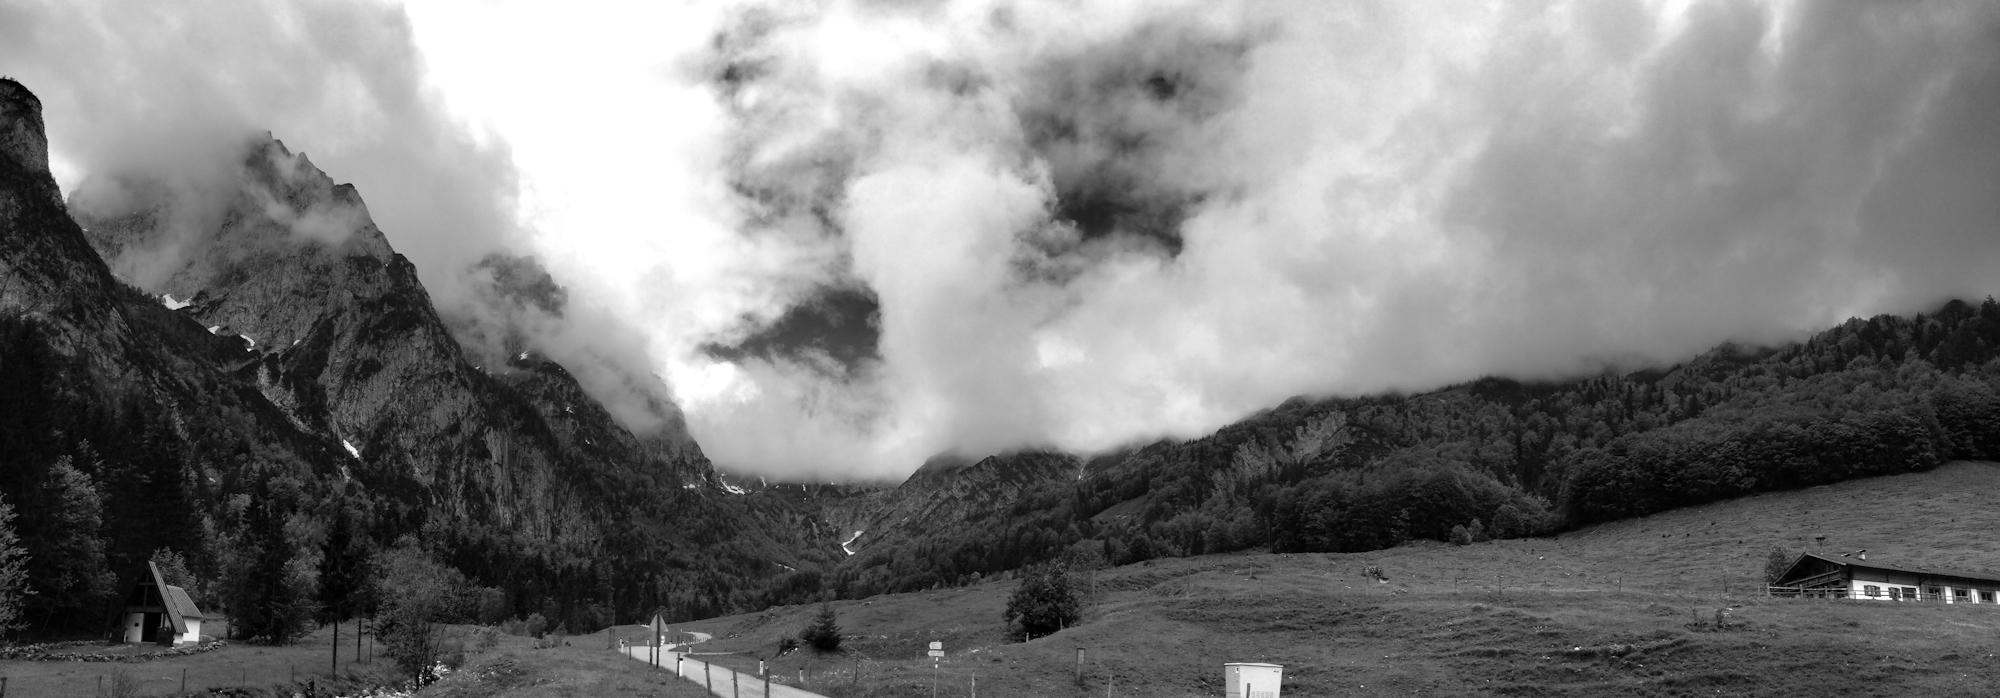 Iphone 4S, Panorama, Finish Snapseed